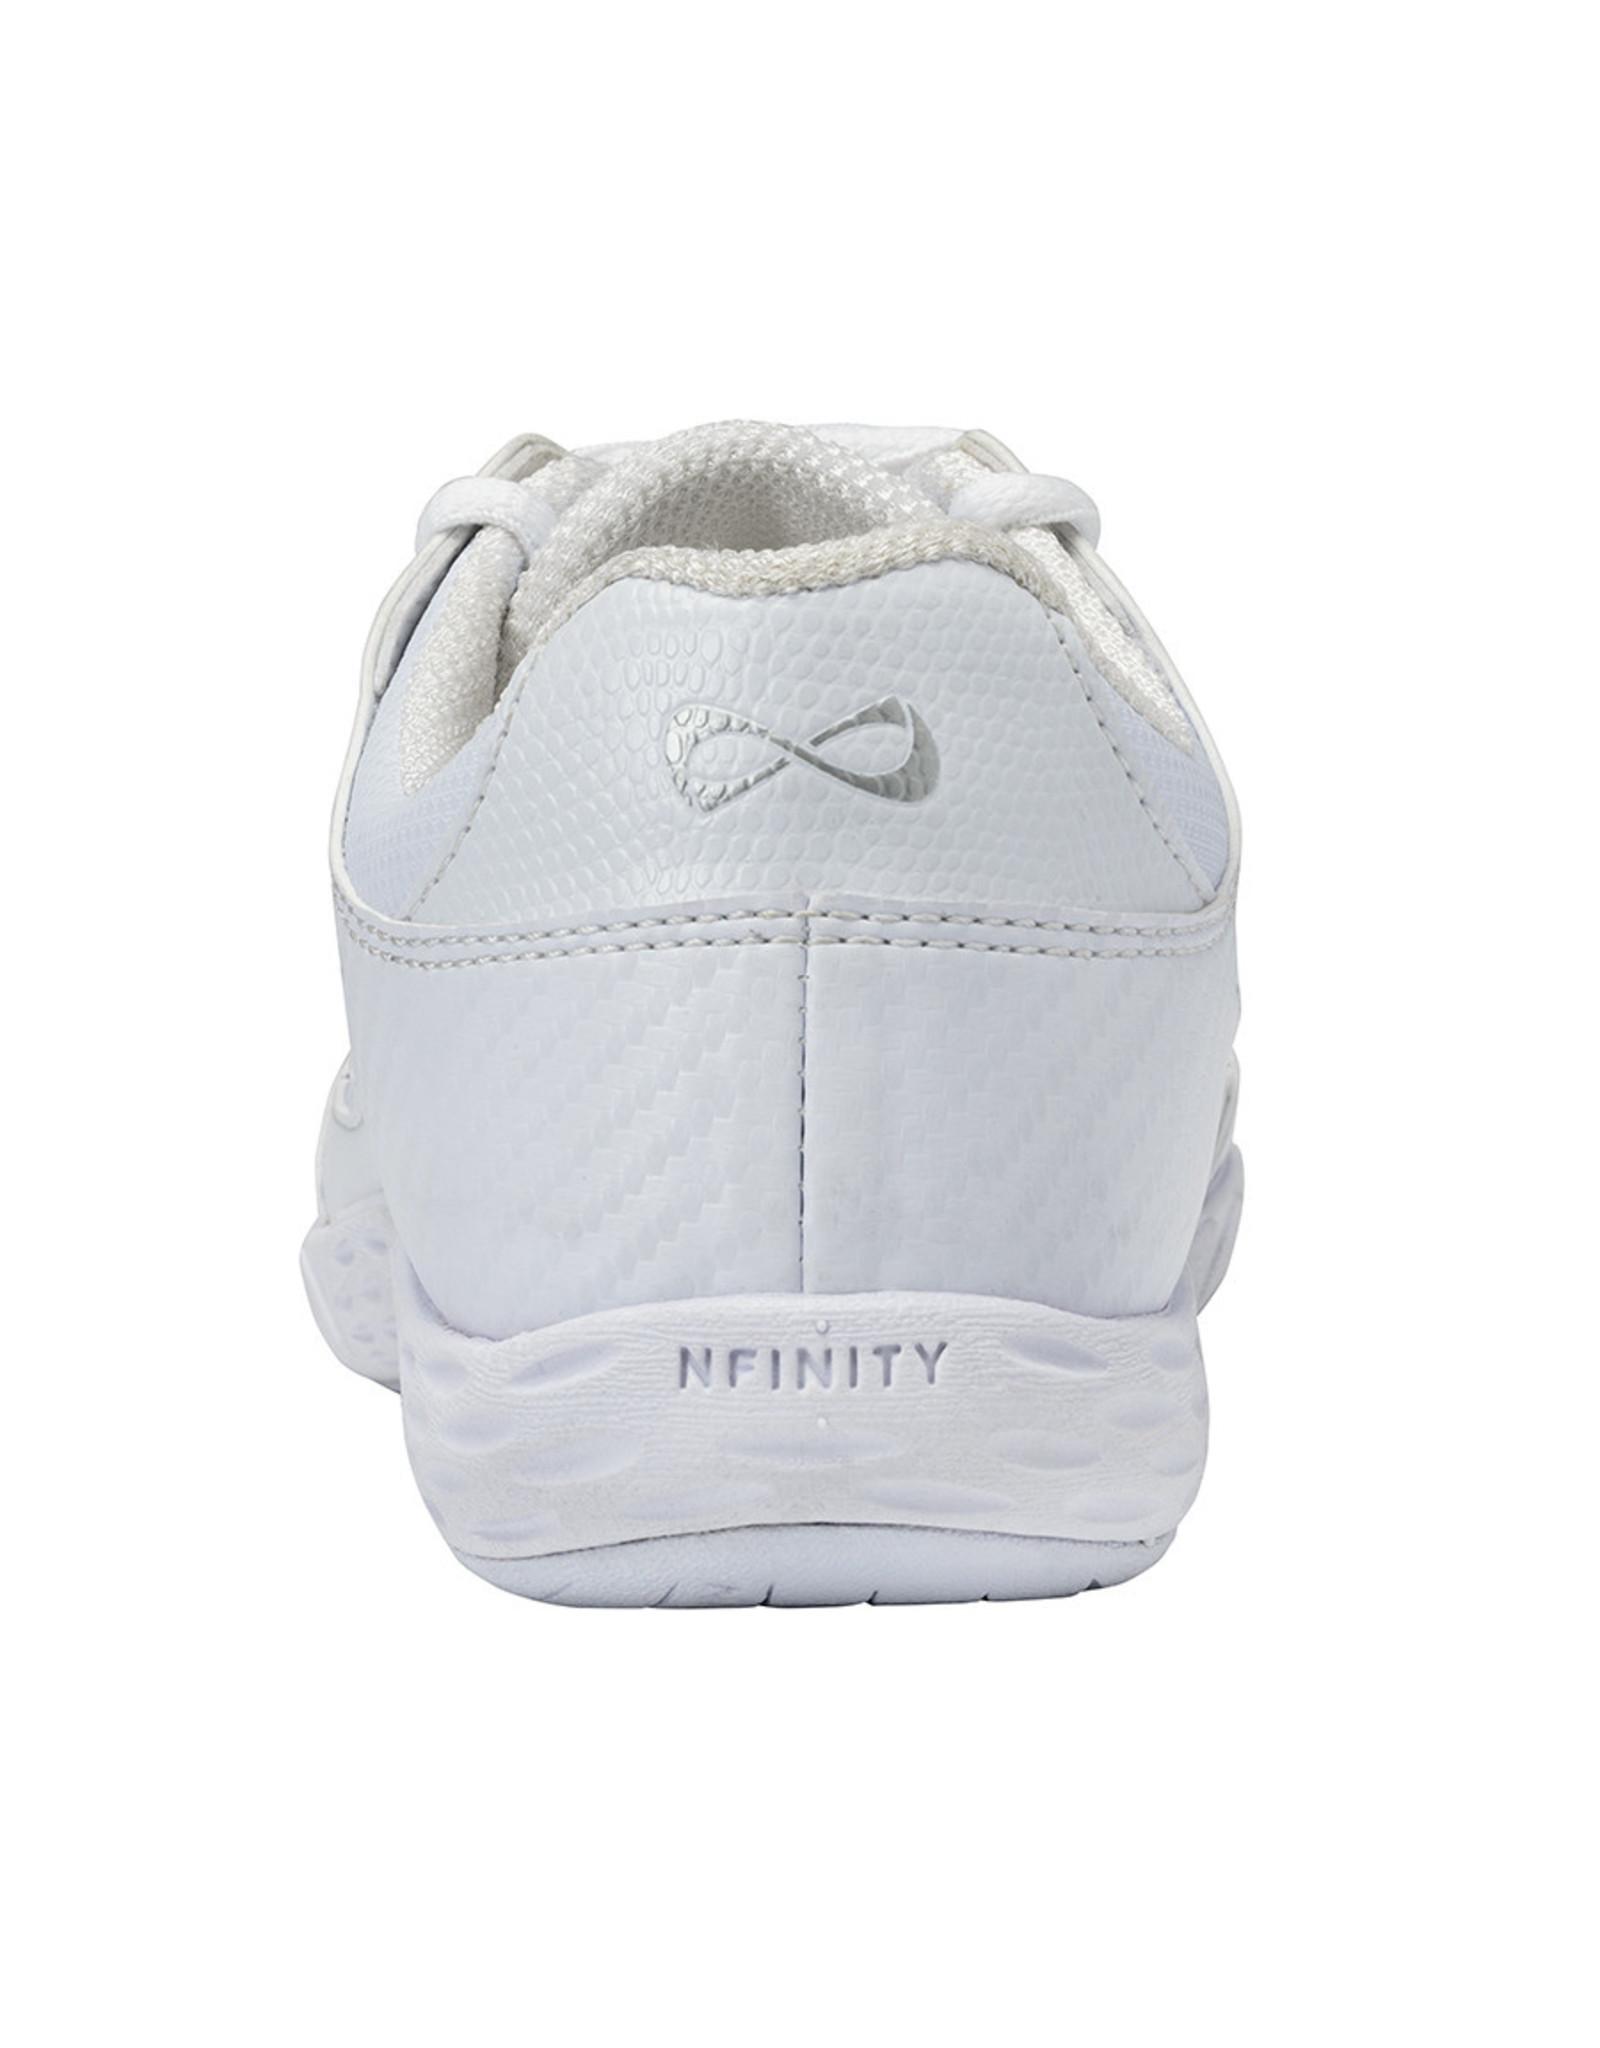 Nfinity Nfinity Rival Cheer Shoe